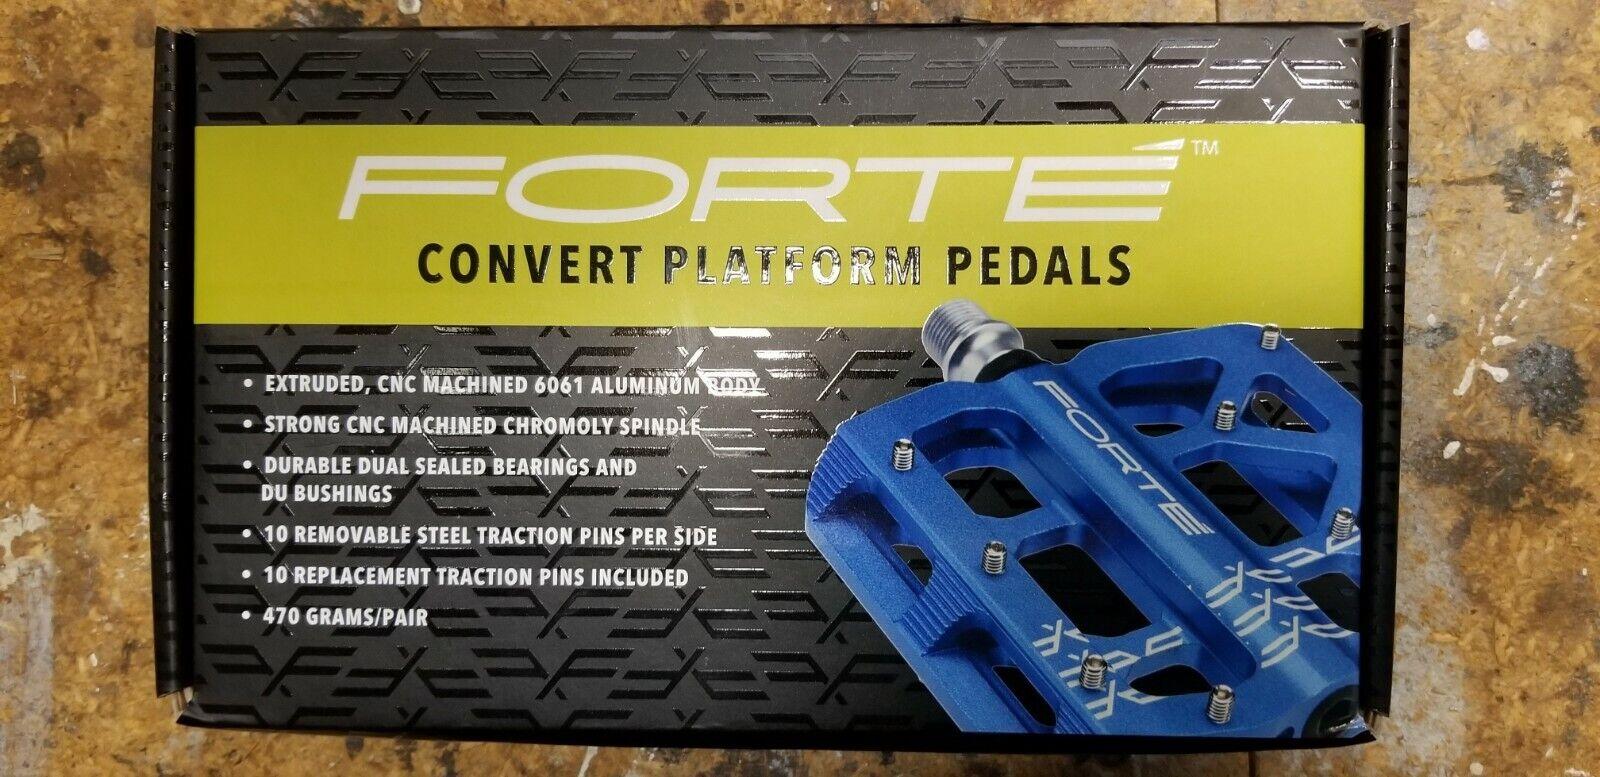 Forte converdeir Plataforma Pedales,  Color Azul  servicio honesto